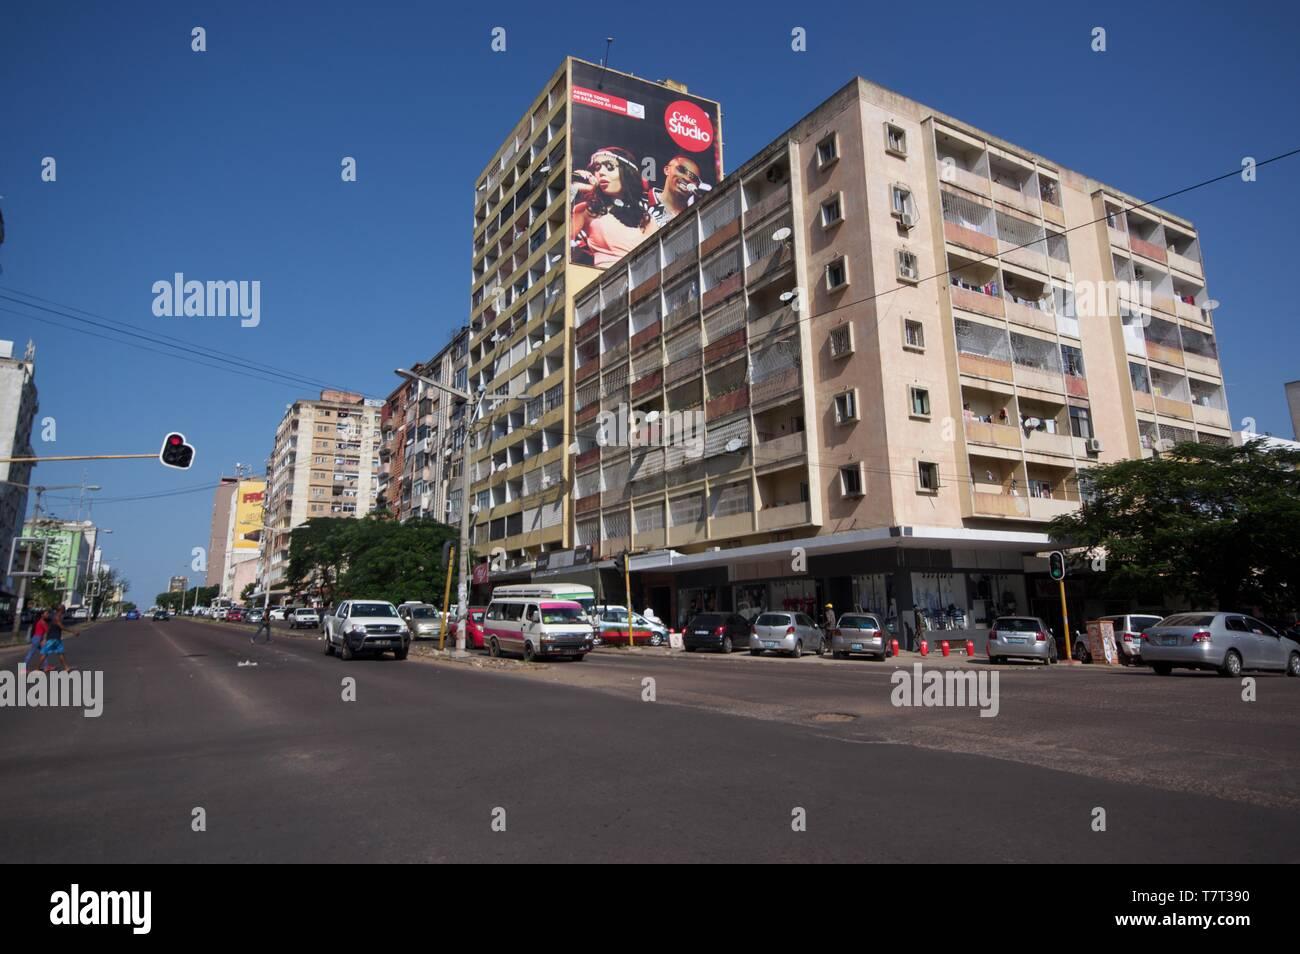 Los edificios en la avenida de Eduardo Mondlane, Maputo, Mozambique Imagen De Stock